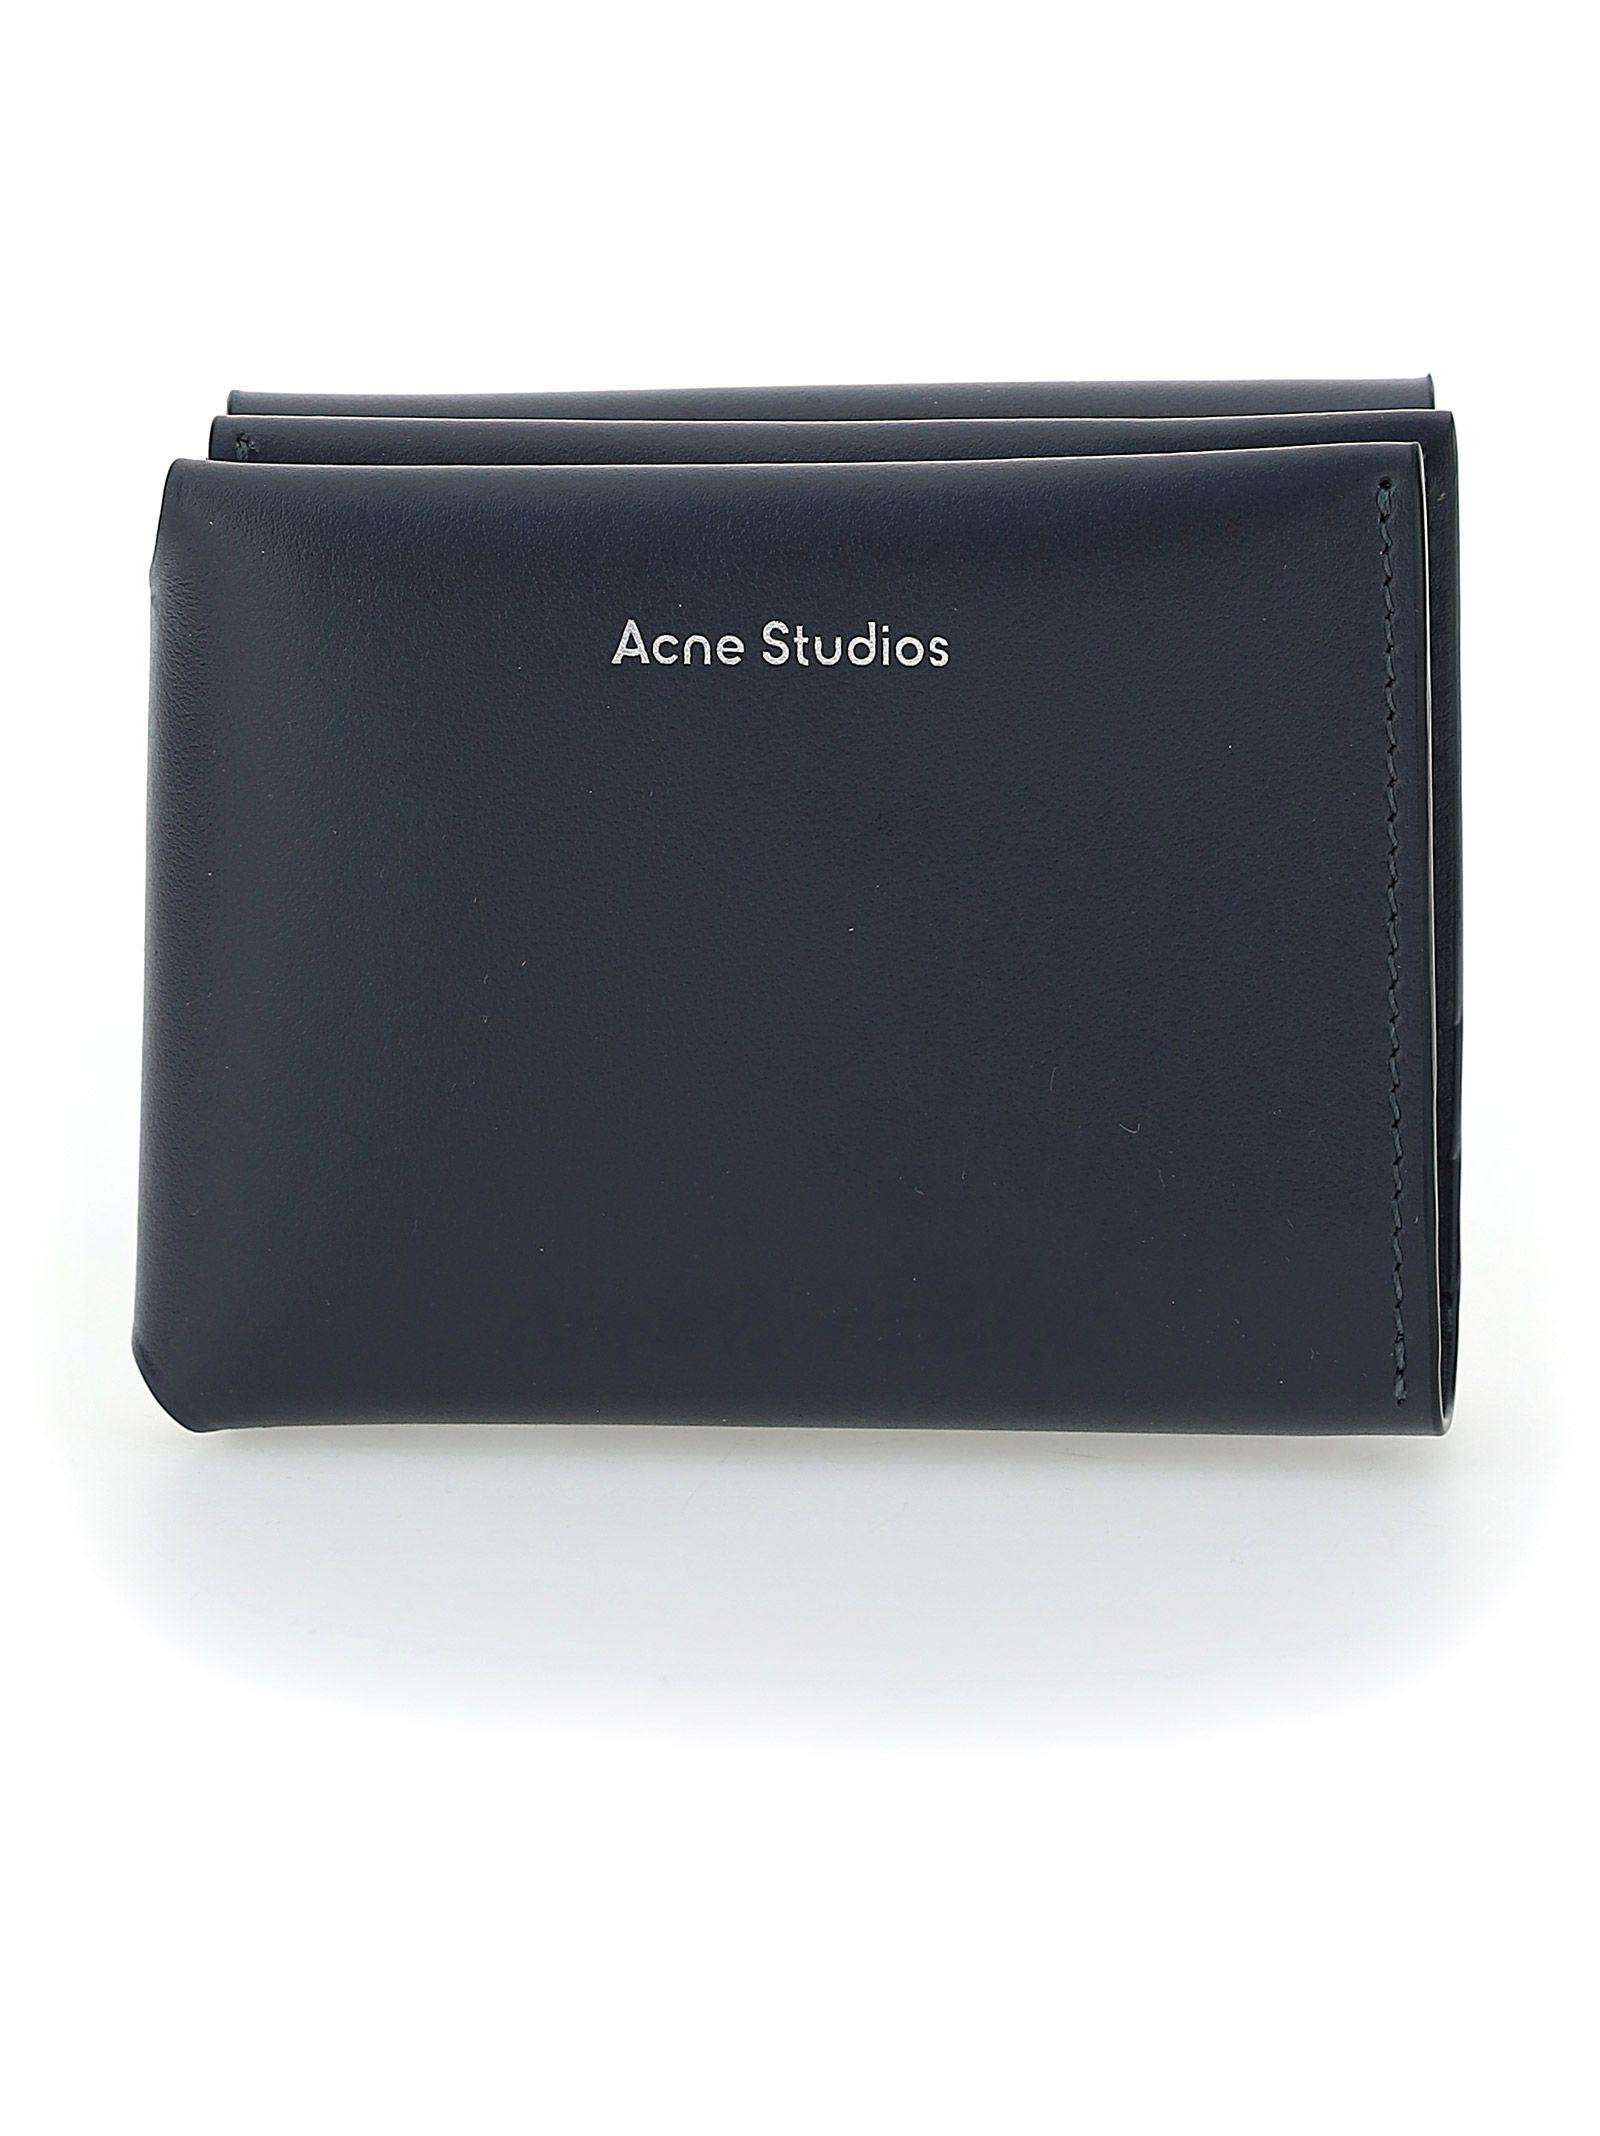 Acne Studios ACNE STUDIOS MEN'S BLUE OTHER MATERIALS WALLET